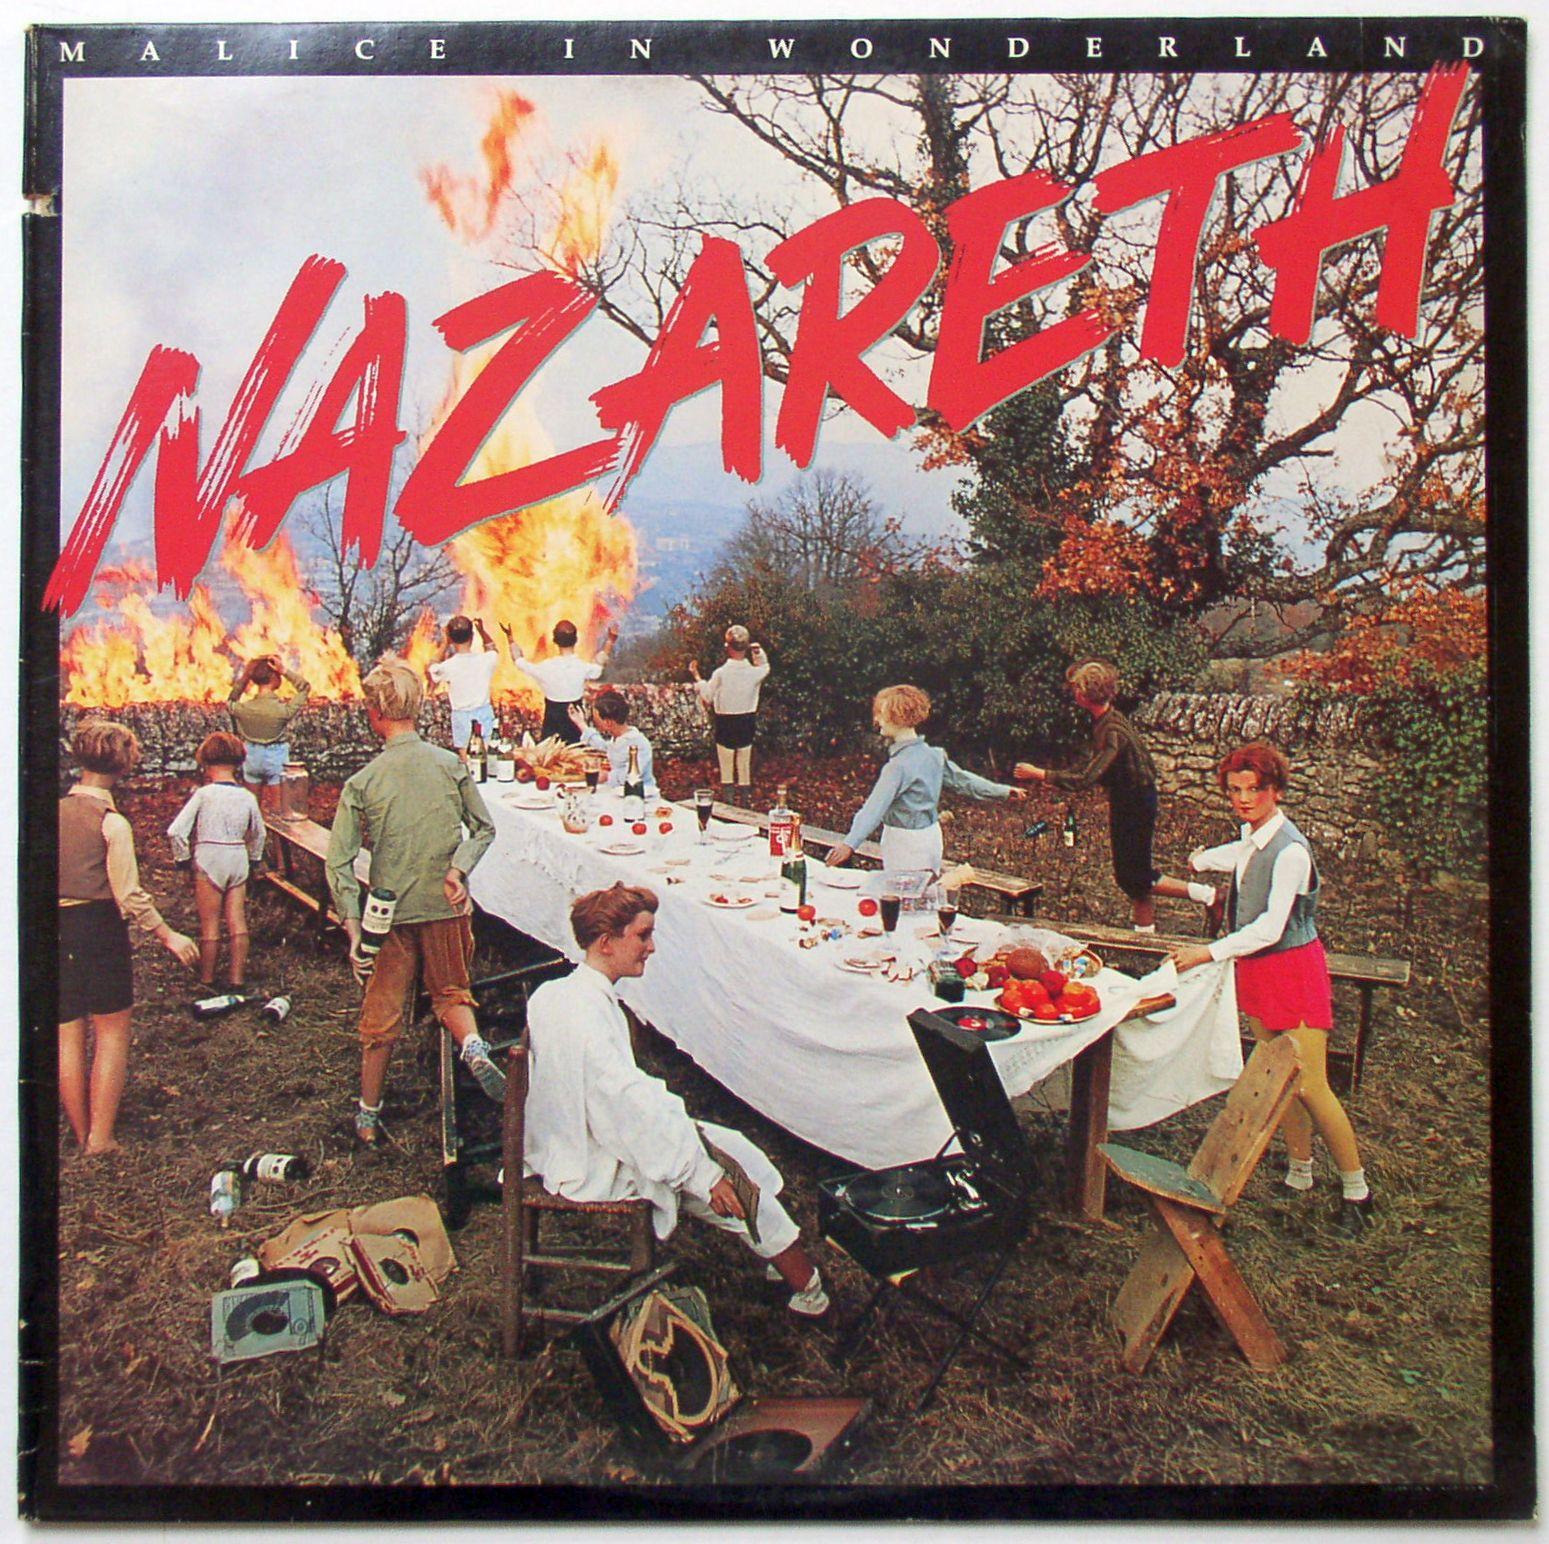 Nazareth Malice In Wonderland Thingery Previews